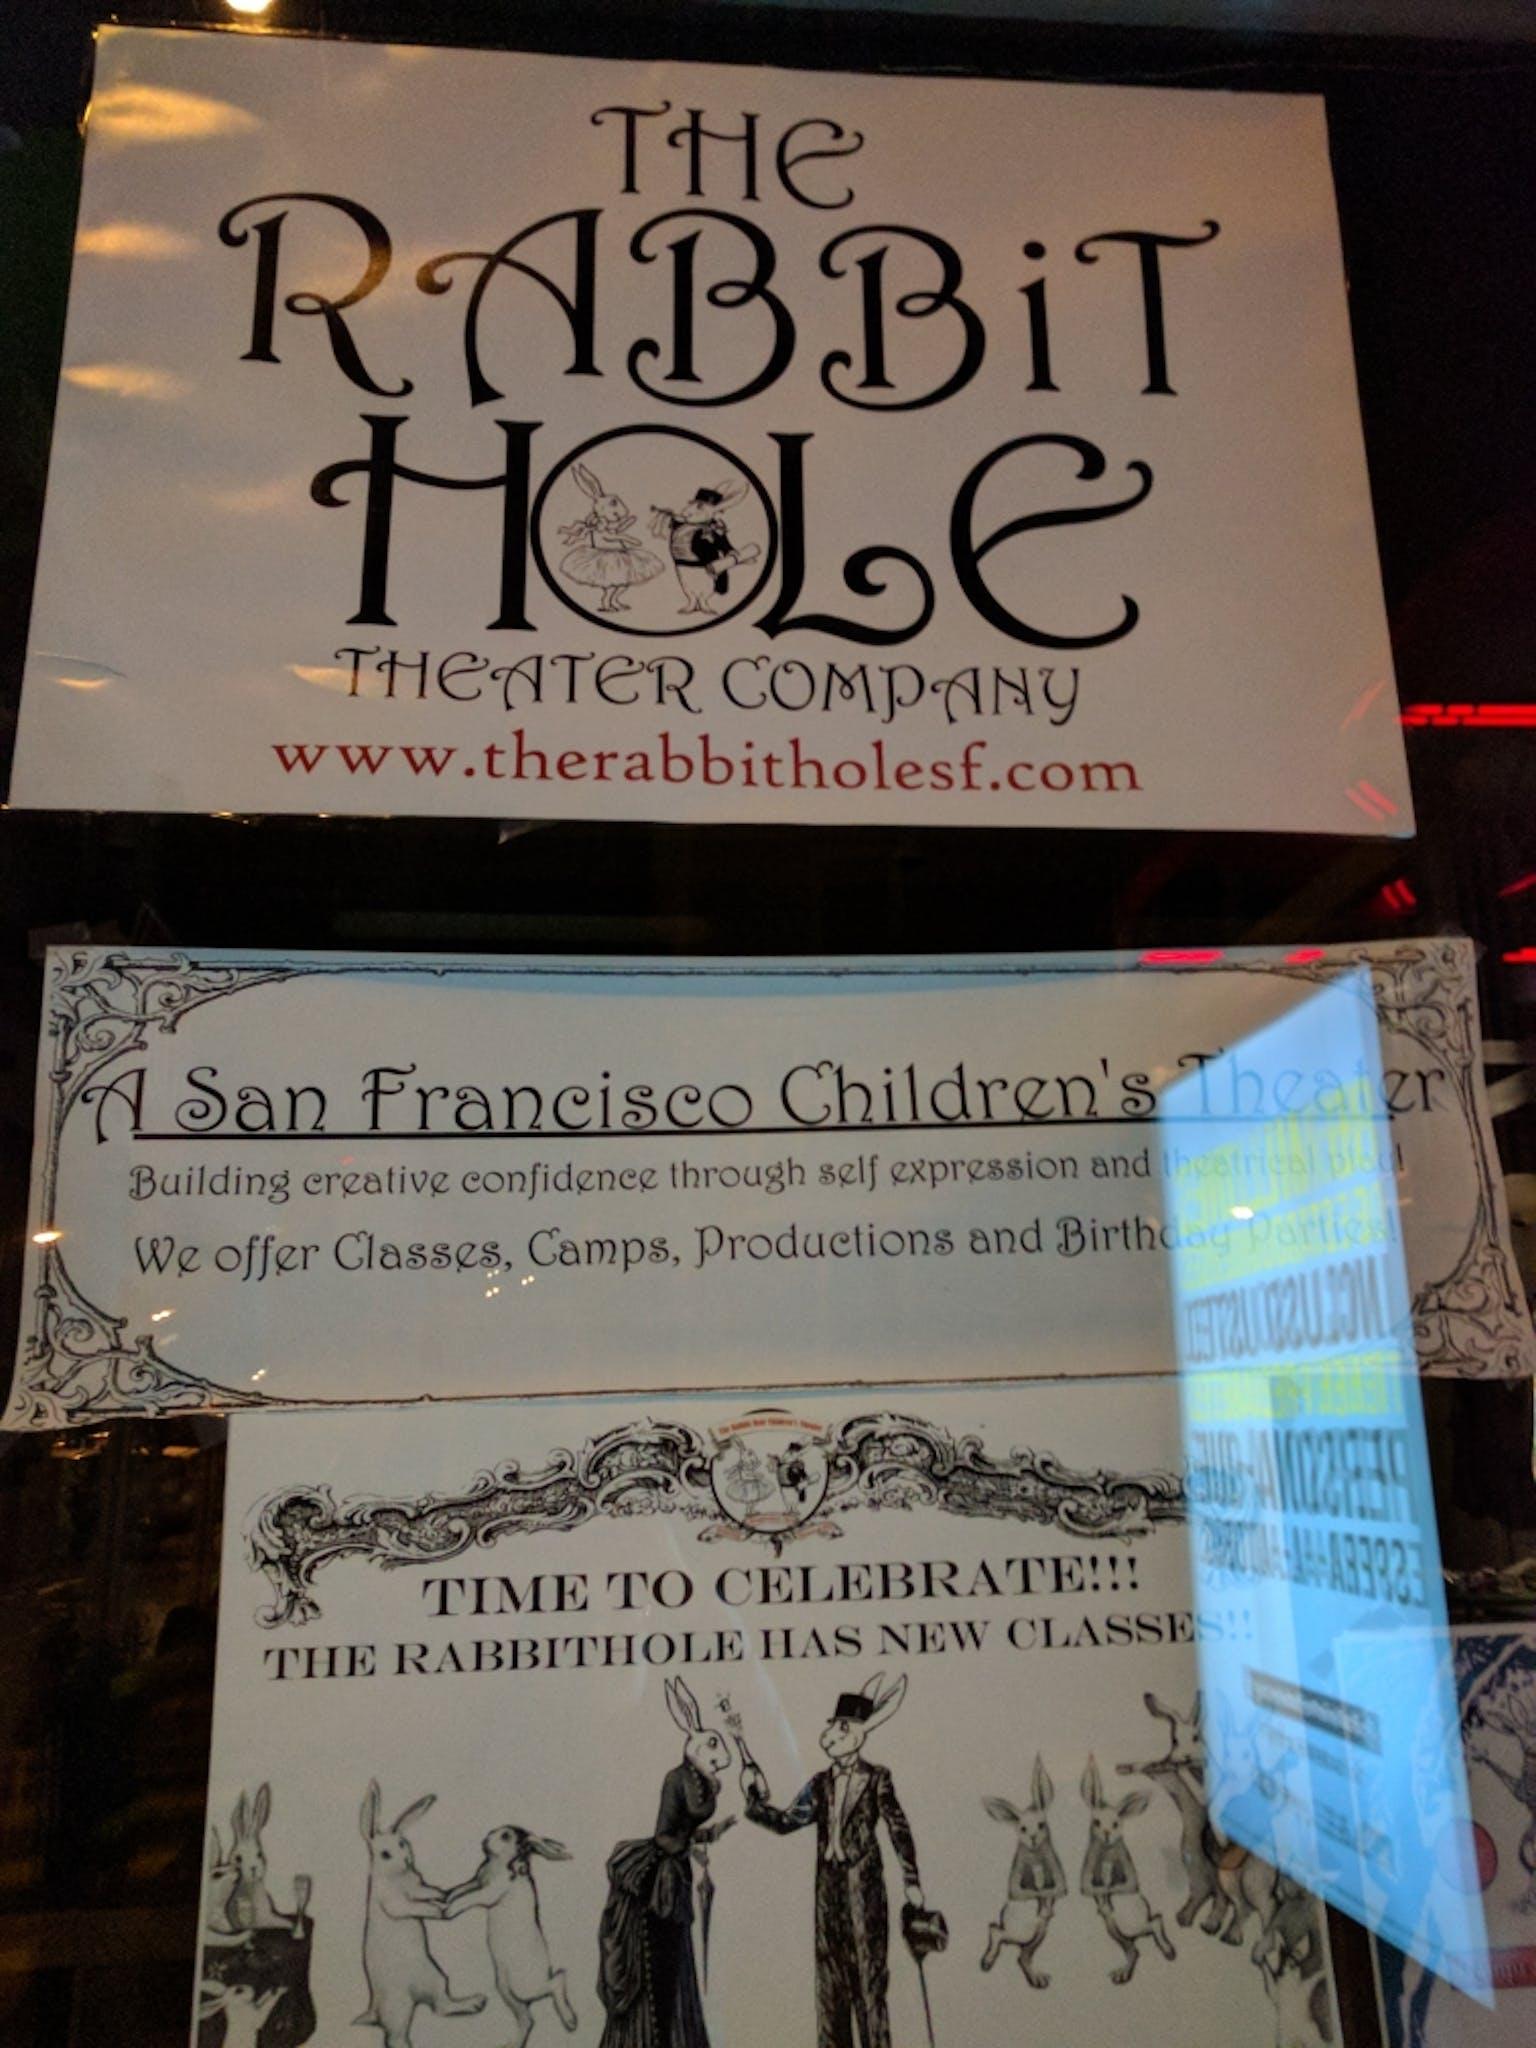 The Rabbit Hole in San Francisco, CA